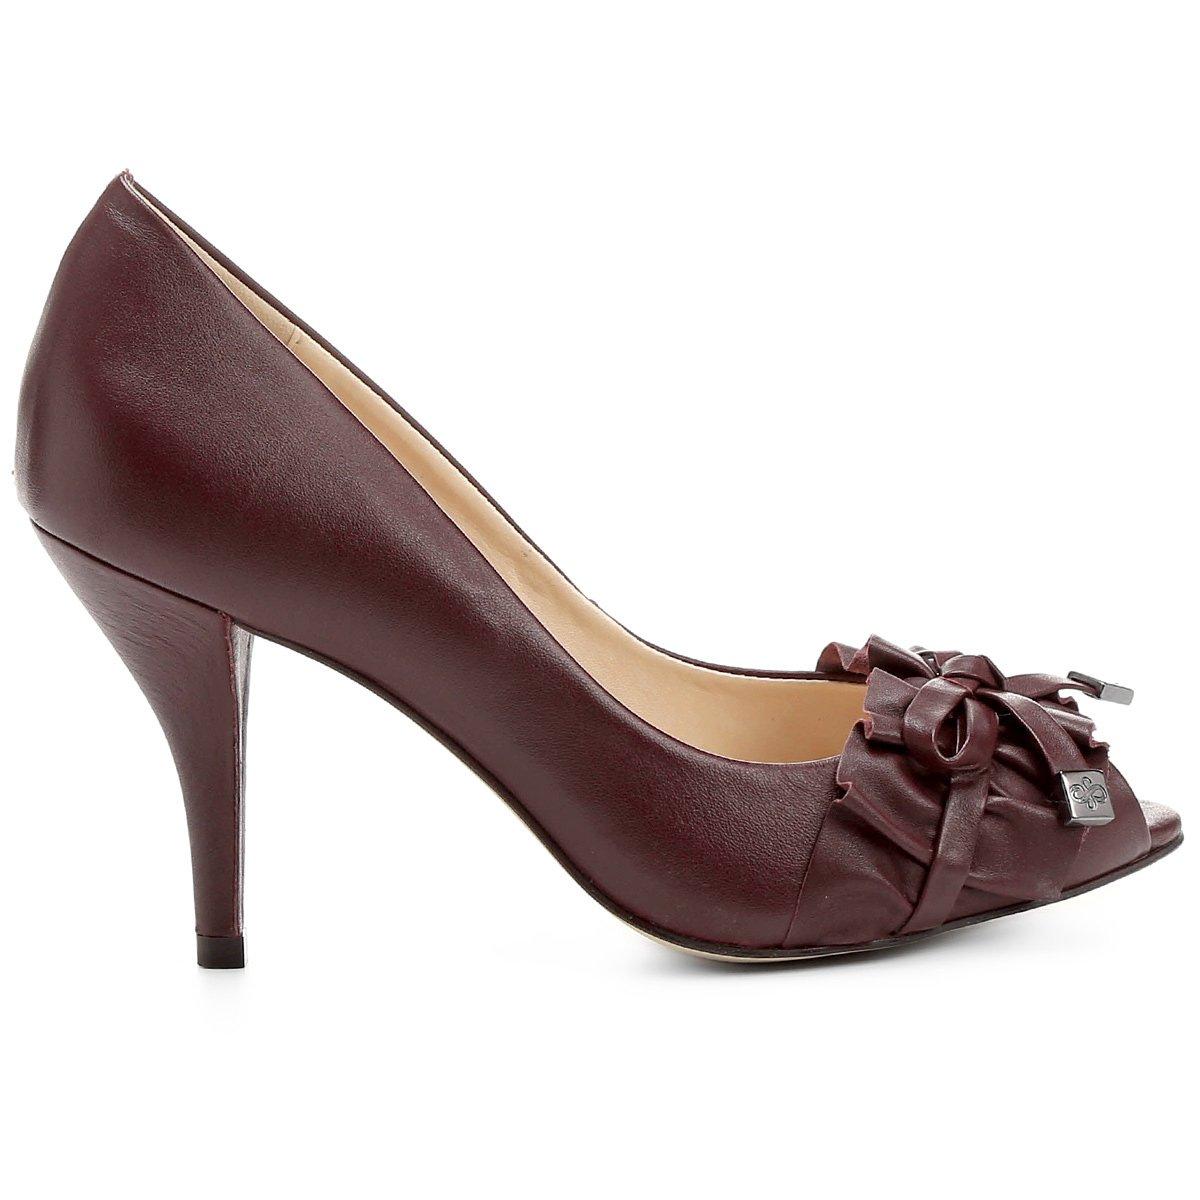 Babado Fino Vinho Toe Peep Couro Toe Shoestock Salto Shoestock Peep Couro Oxq0Sw7